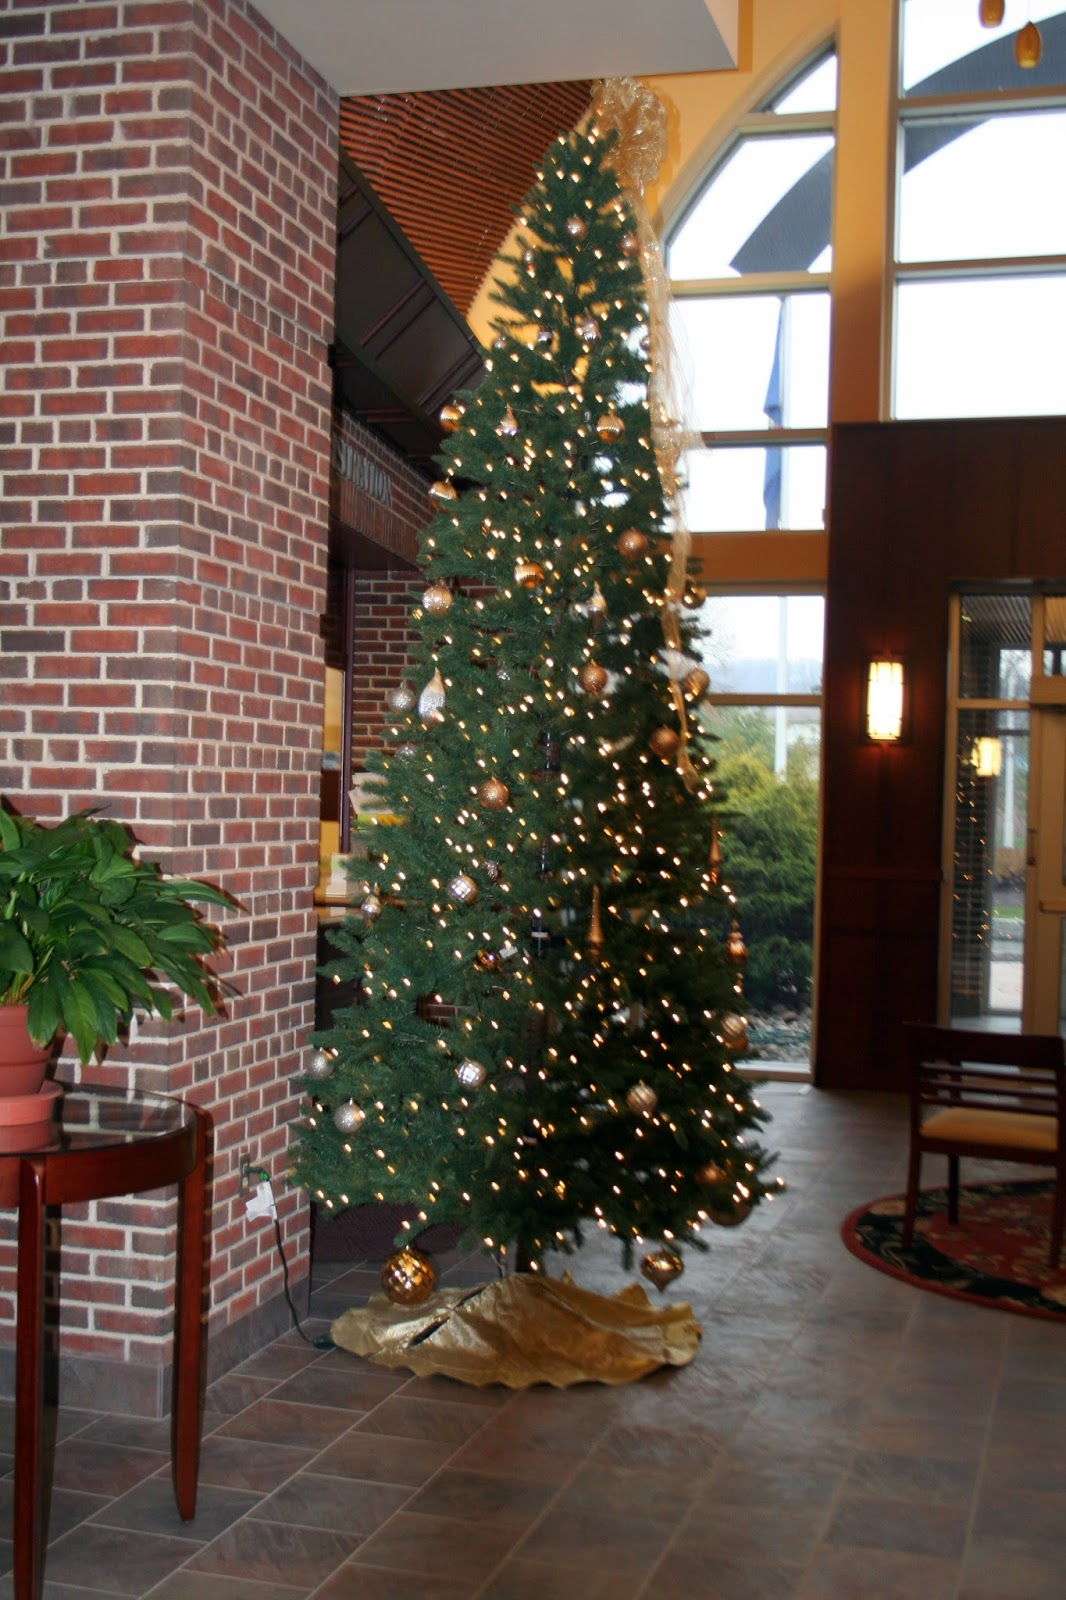 Lehigh valley ramblings bushkill tp has no christmas tree